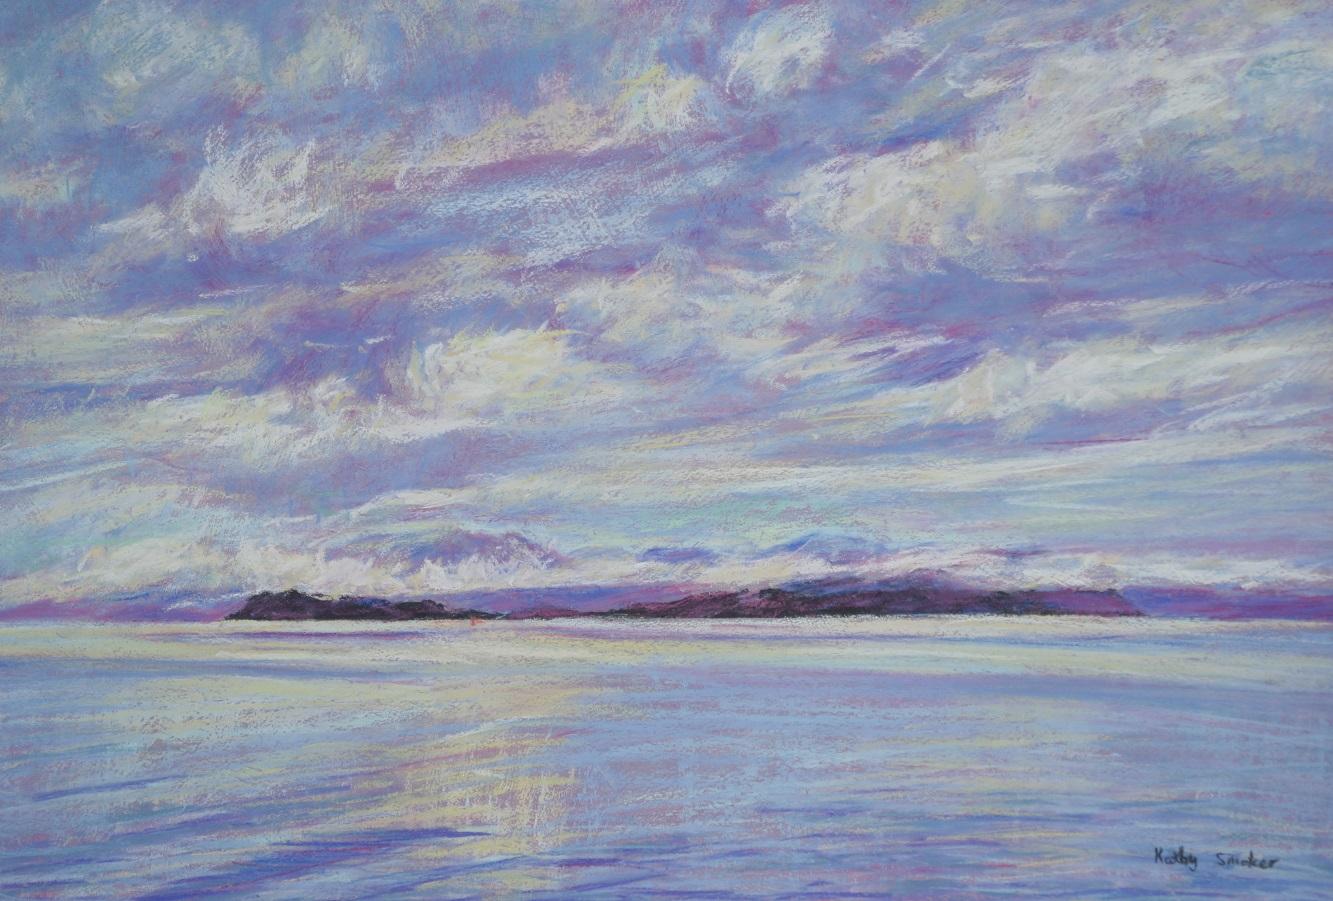 Grey Day, Macquarie Harbour.II. 37x55cm.